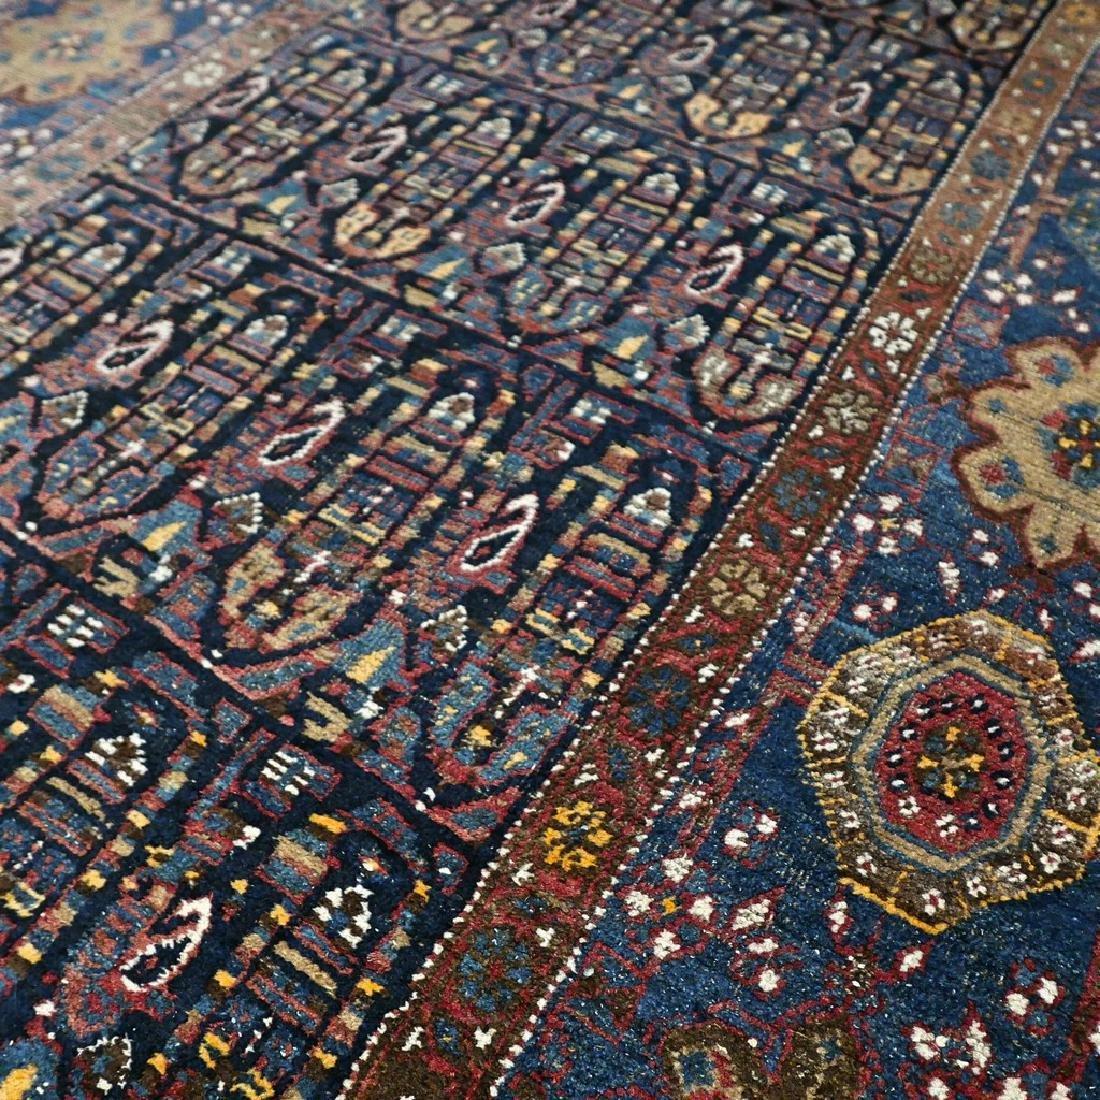 10.1x4.3 Antique Armenian boteh Kazak rug - 1880s - - 7